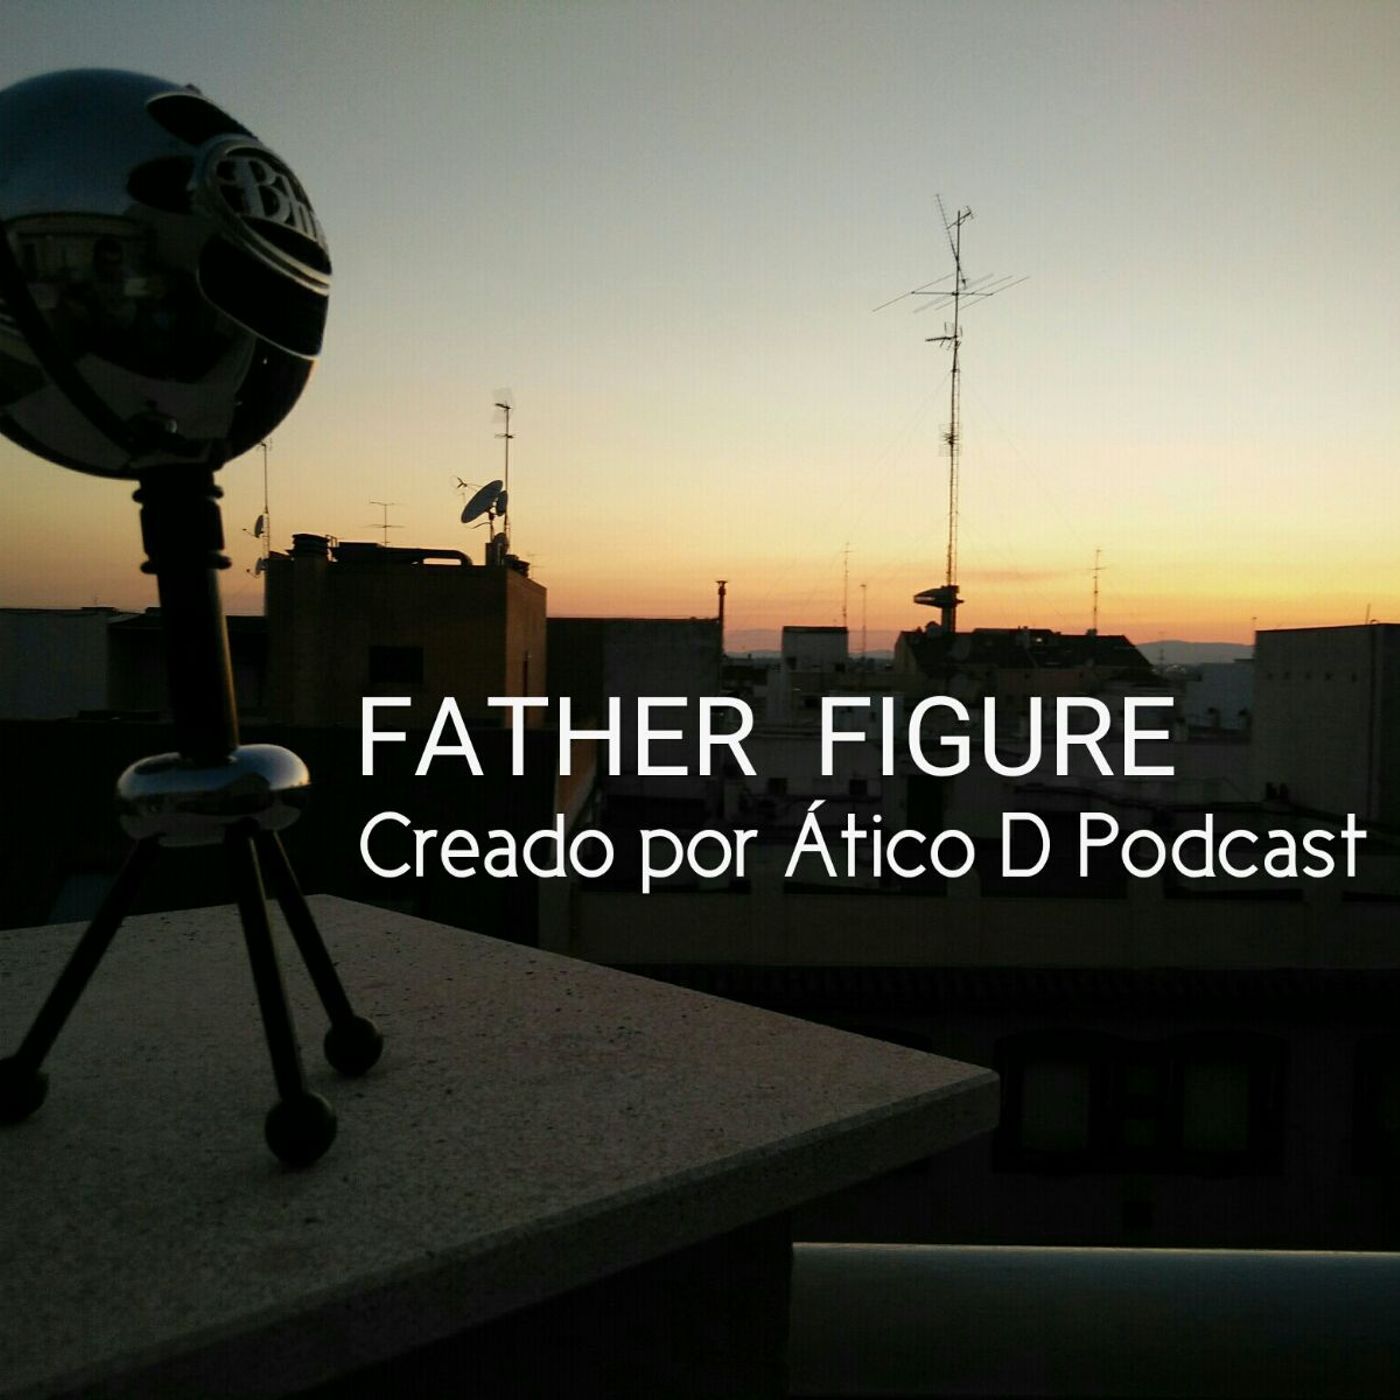 Logo de FATHER FIGURE. Socorro, soy padre